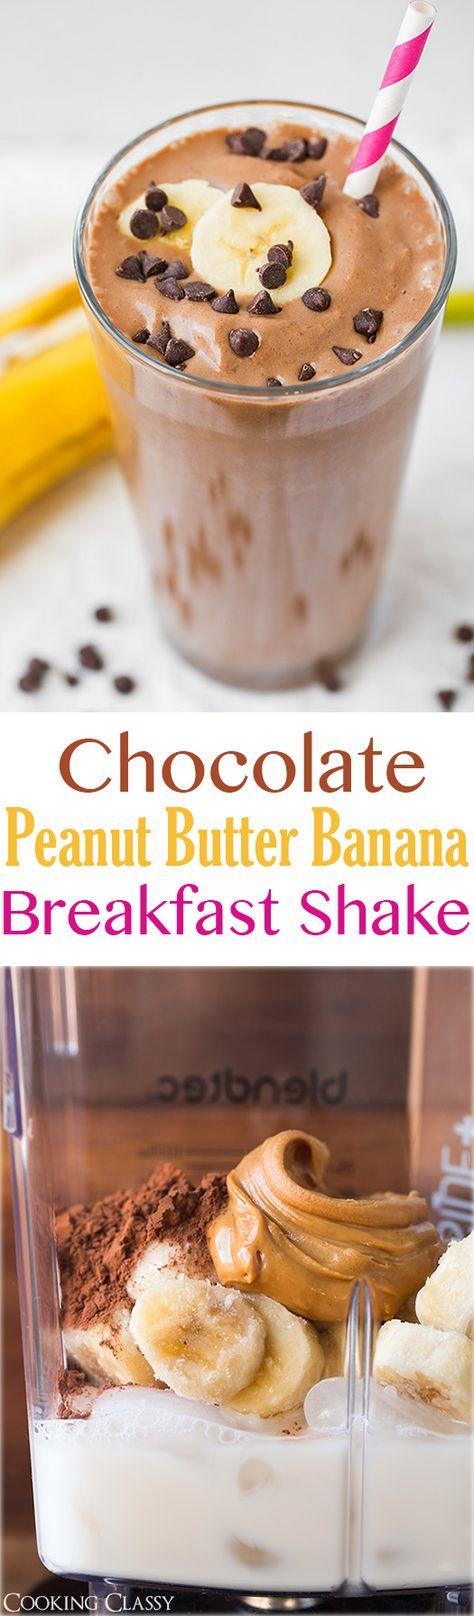 Chocolate Peanut Butter Banana Breakfast Shake - healthy, easy to make and tastes like a shake! http://papasteves.com